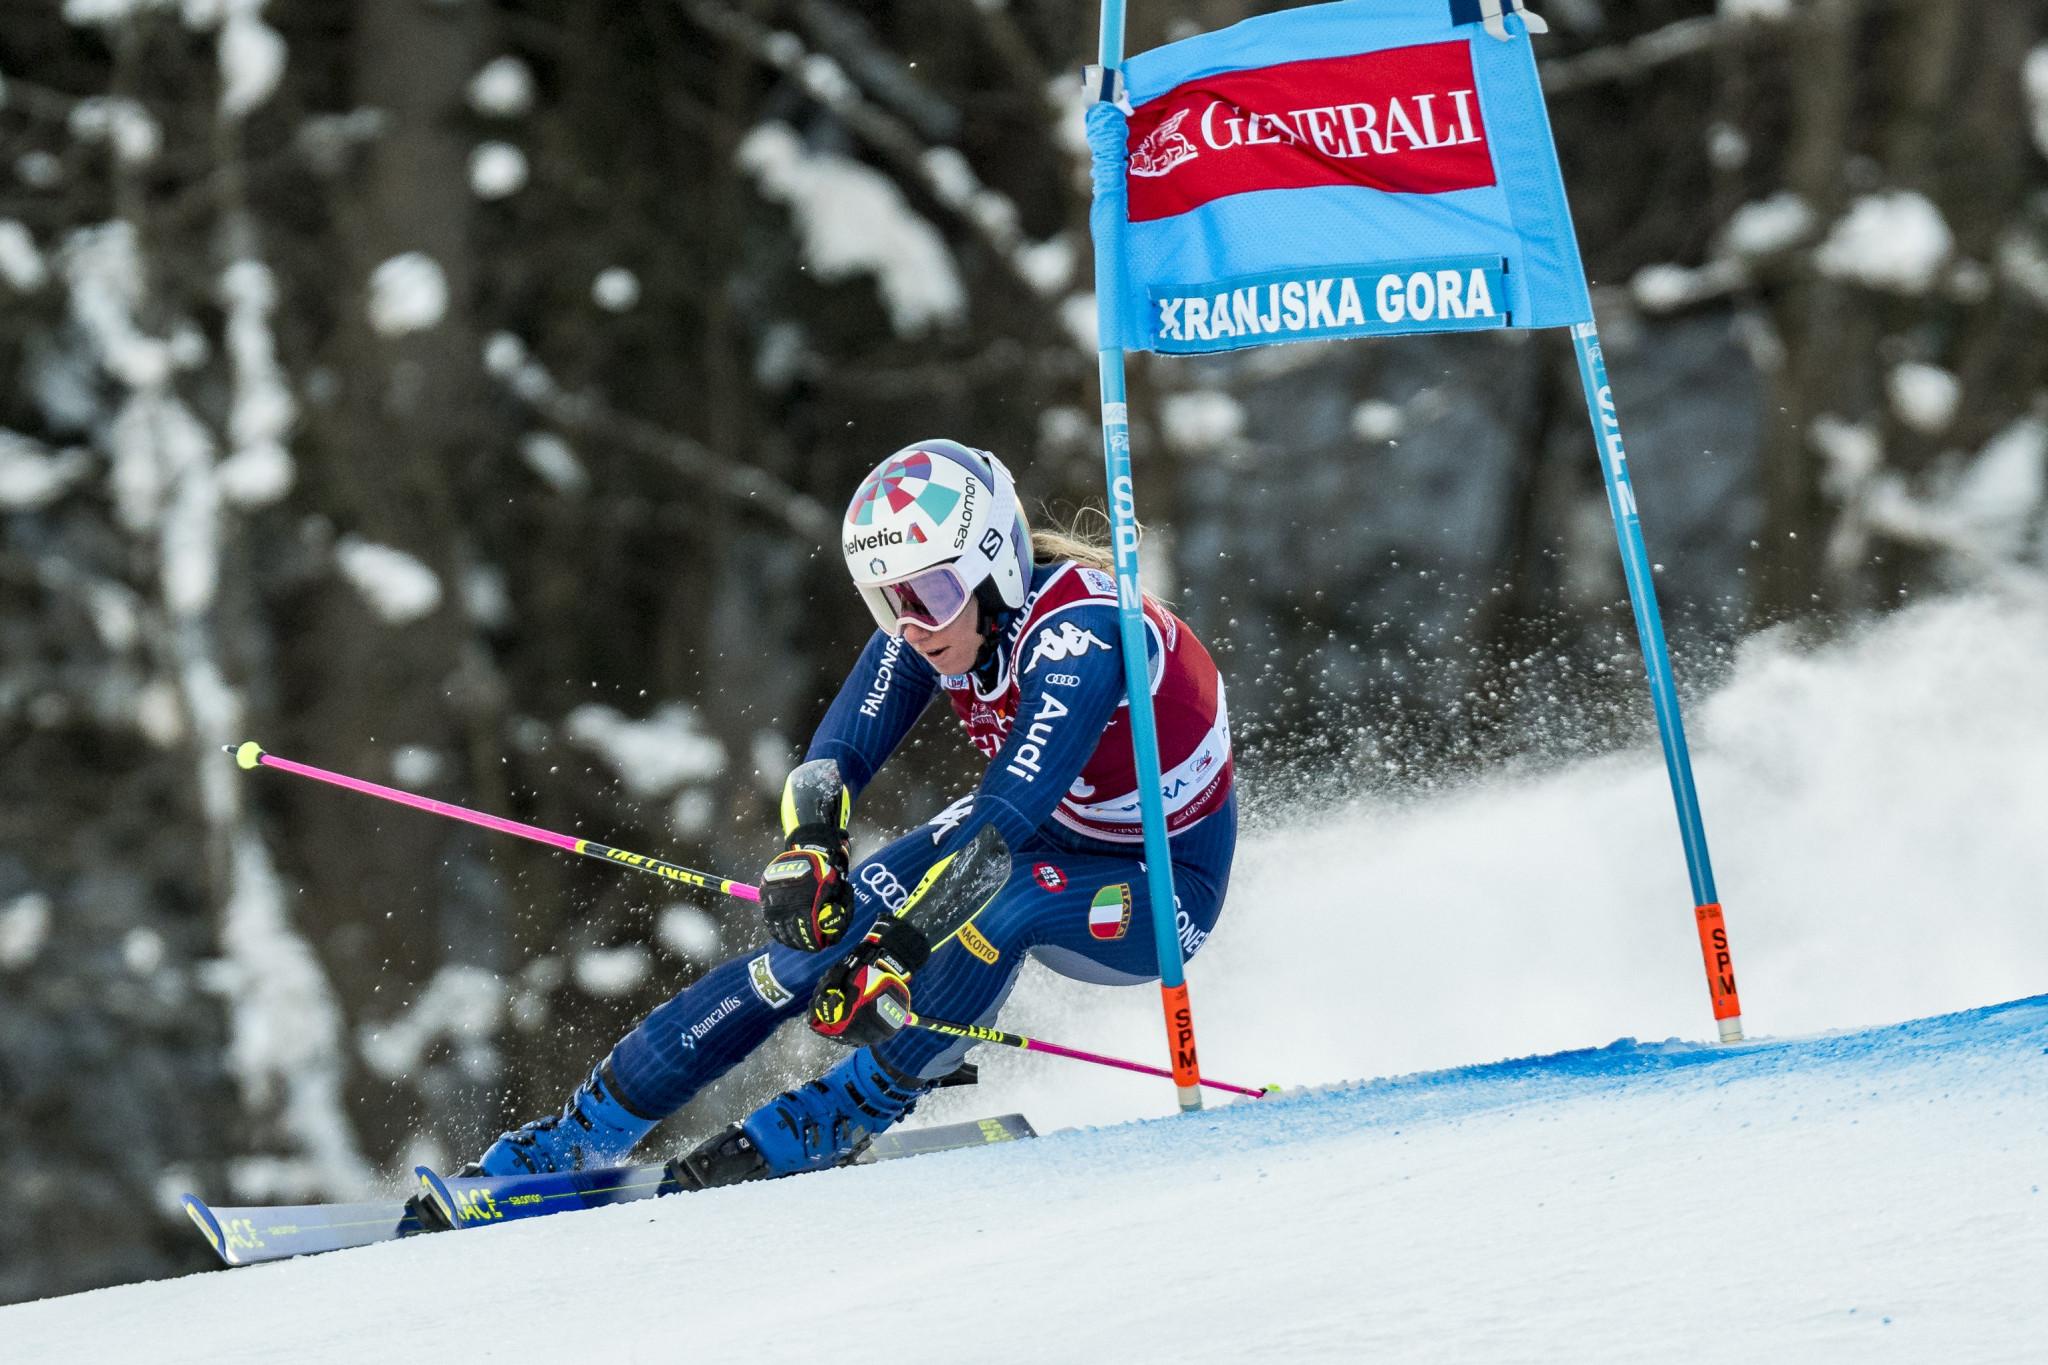 Bassino collects third giant slalom win of the season in Kranjska Gora